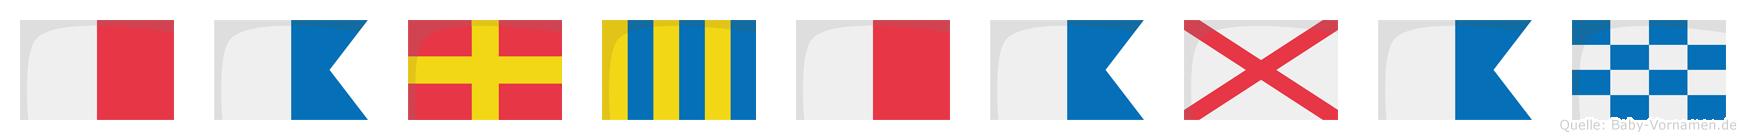 Harghavan im Flaggenalphabet